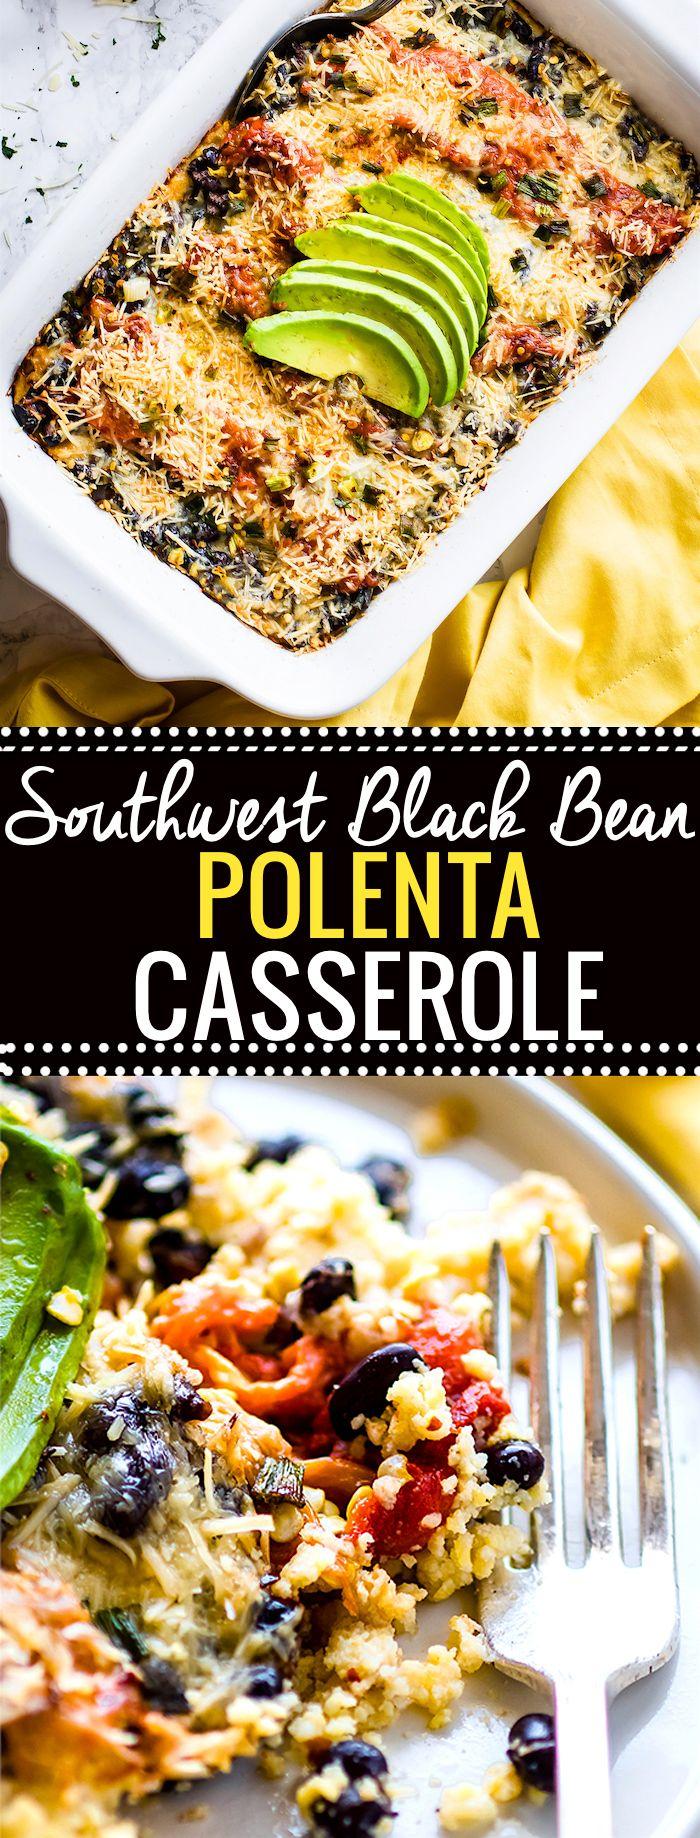 Southwest Black Beans Polenta Casserole! A wholesome gluten free vegetarian…